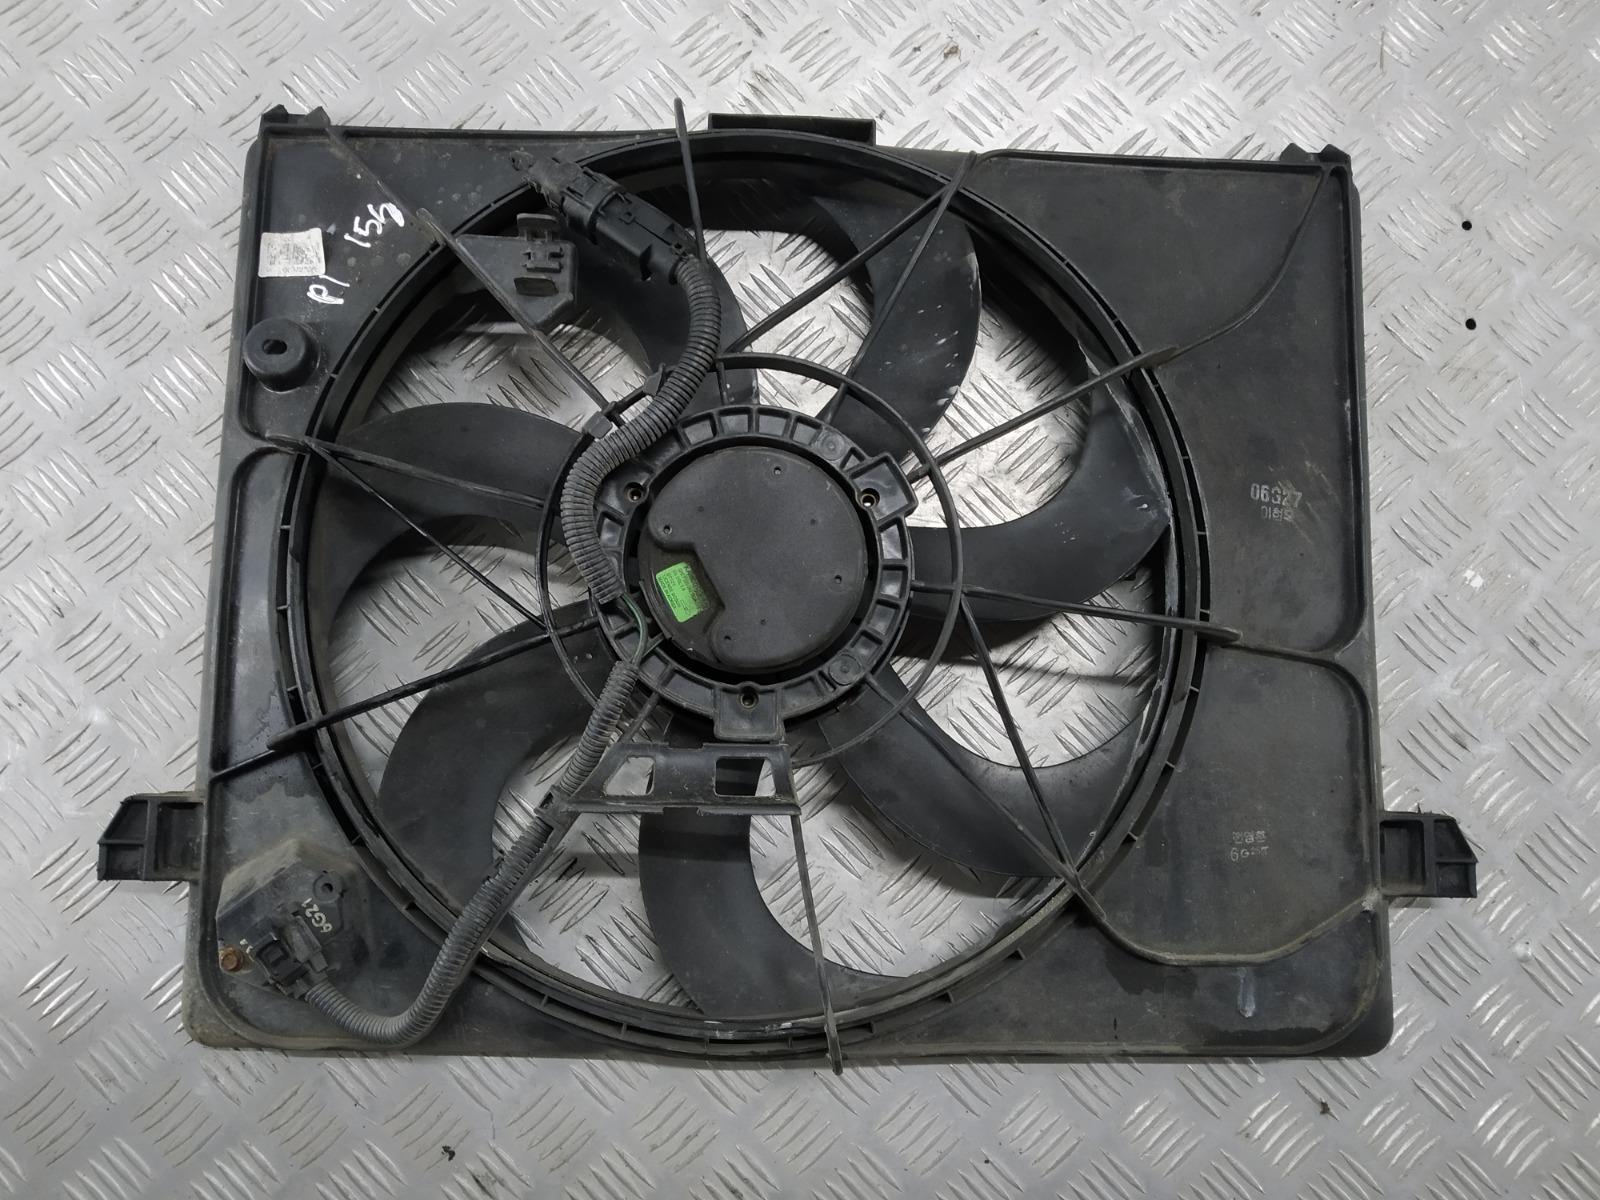 Вентилятор радиатора Kia Carens 2.0 CRDI 2006 (б/у)